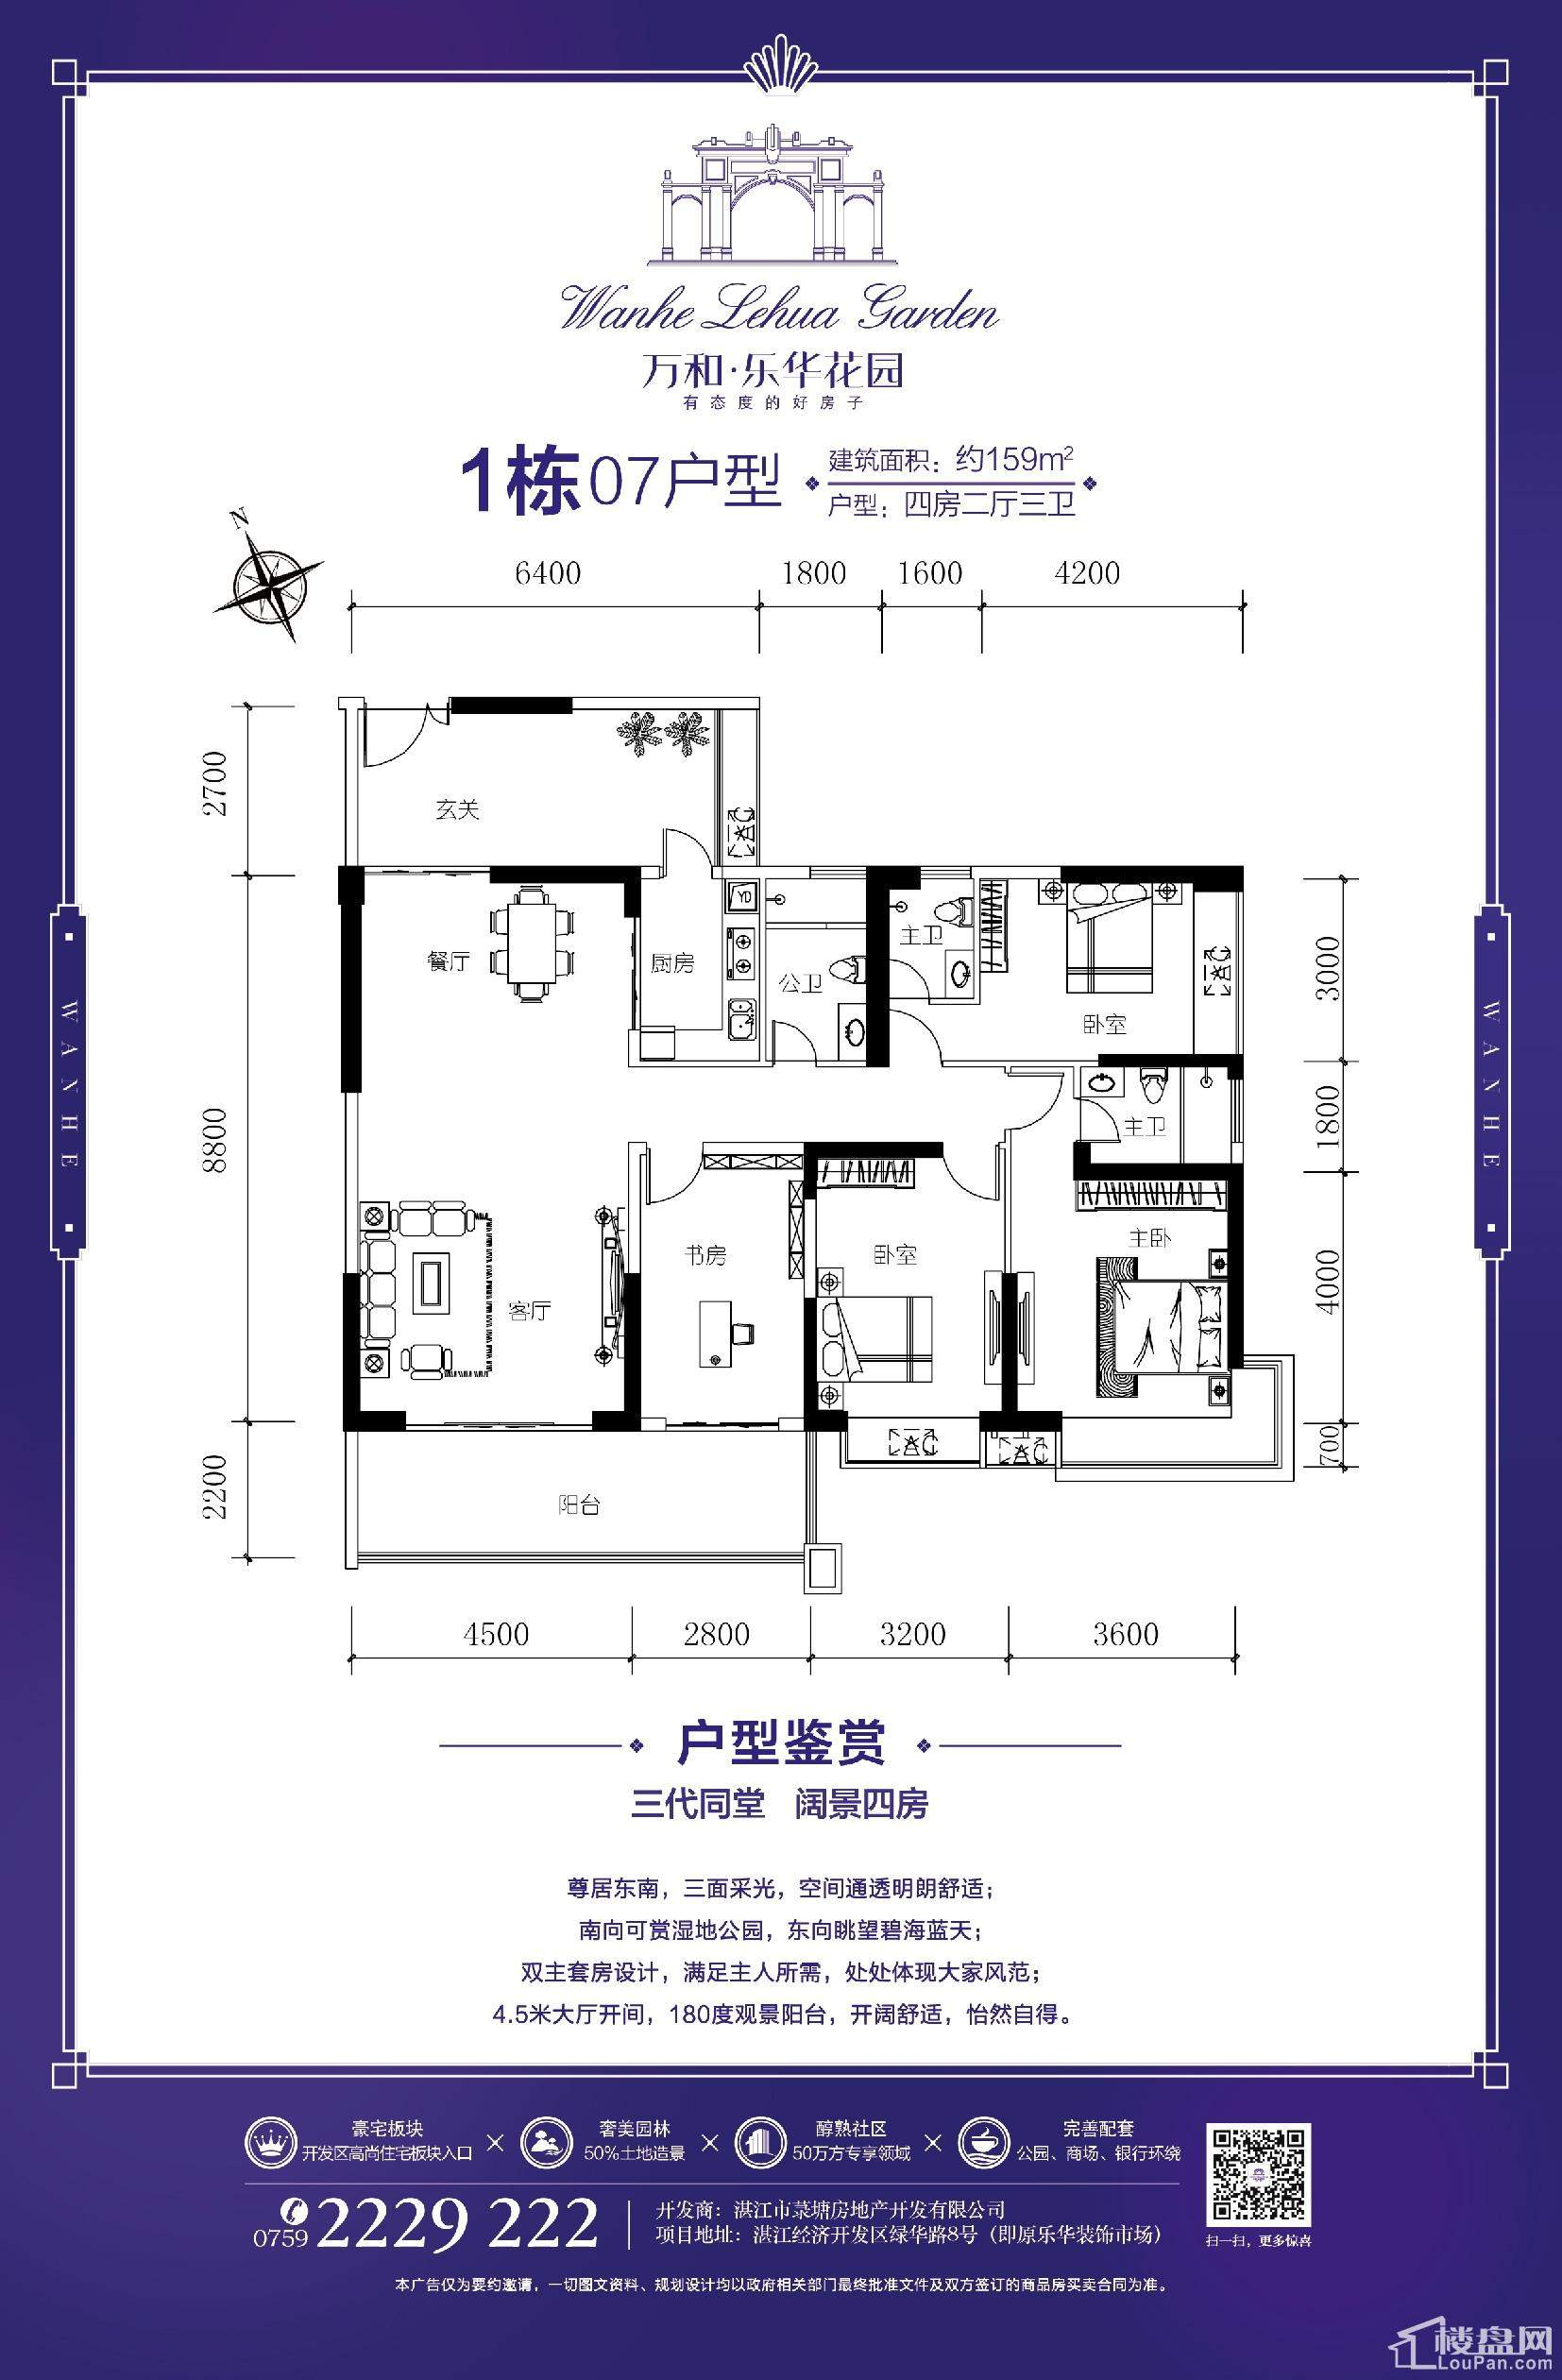 乐华n21v2 电路图